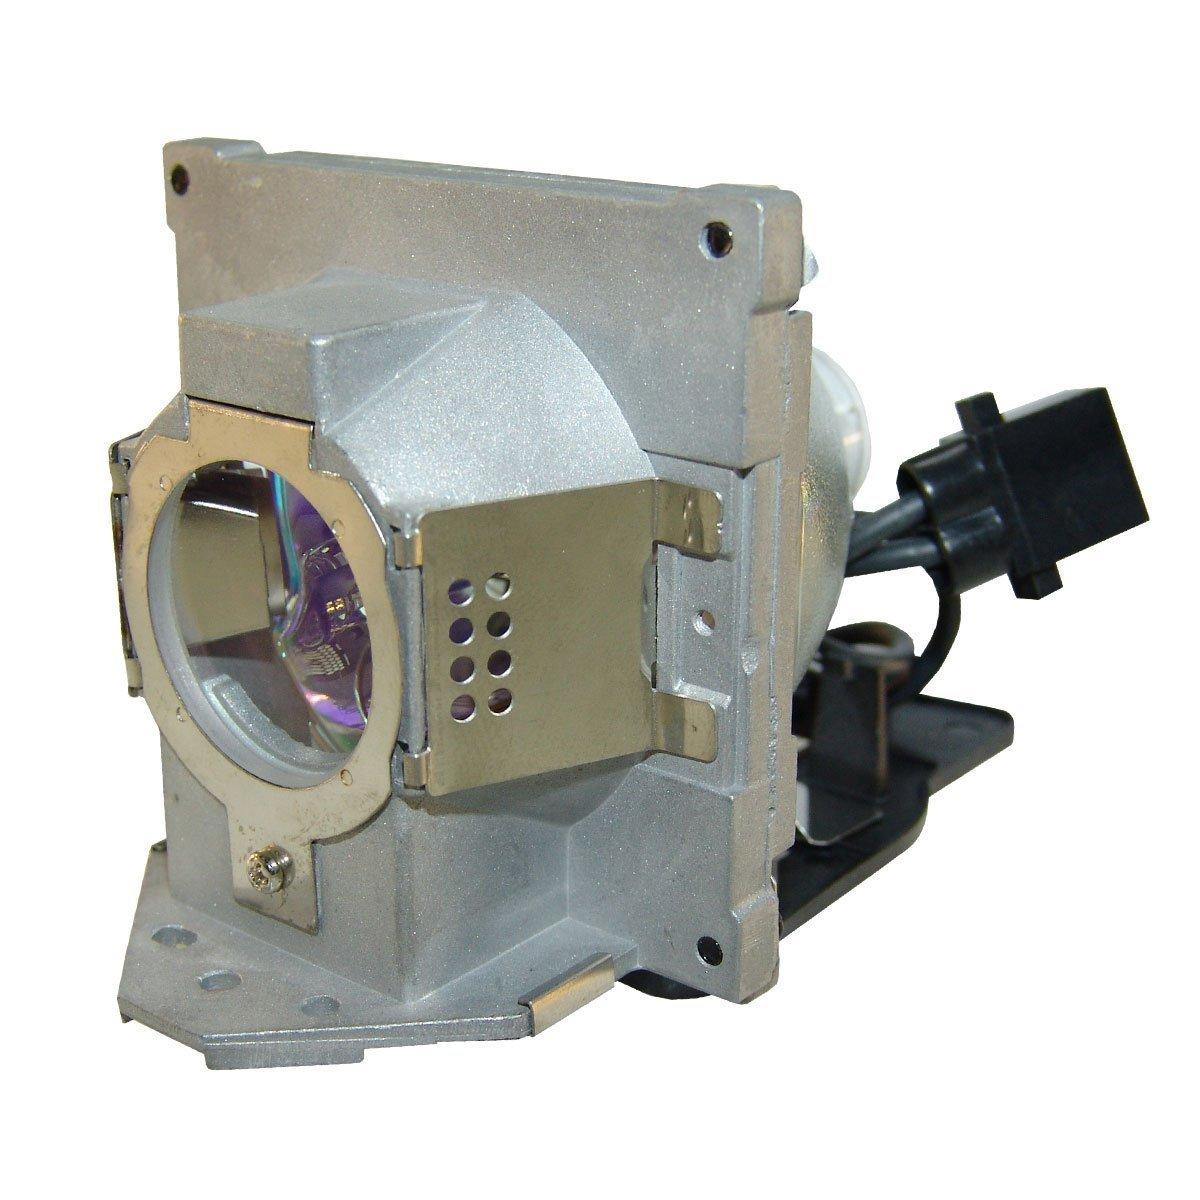 PL9867 200 Watt BenQ LCD Projector Assembly with Original Bulb